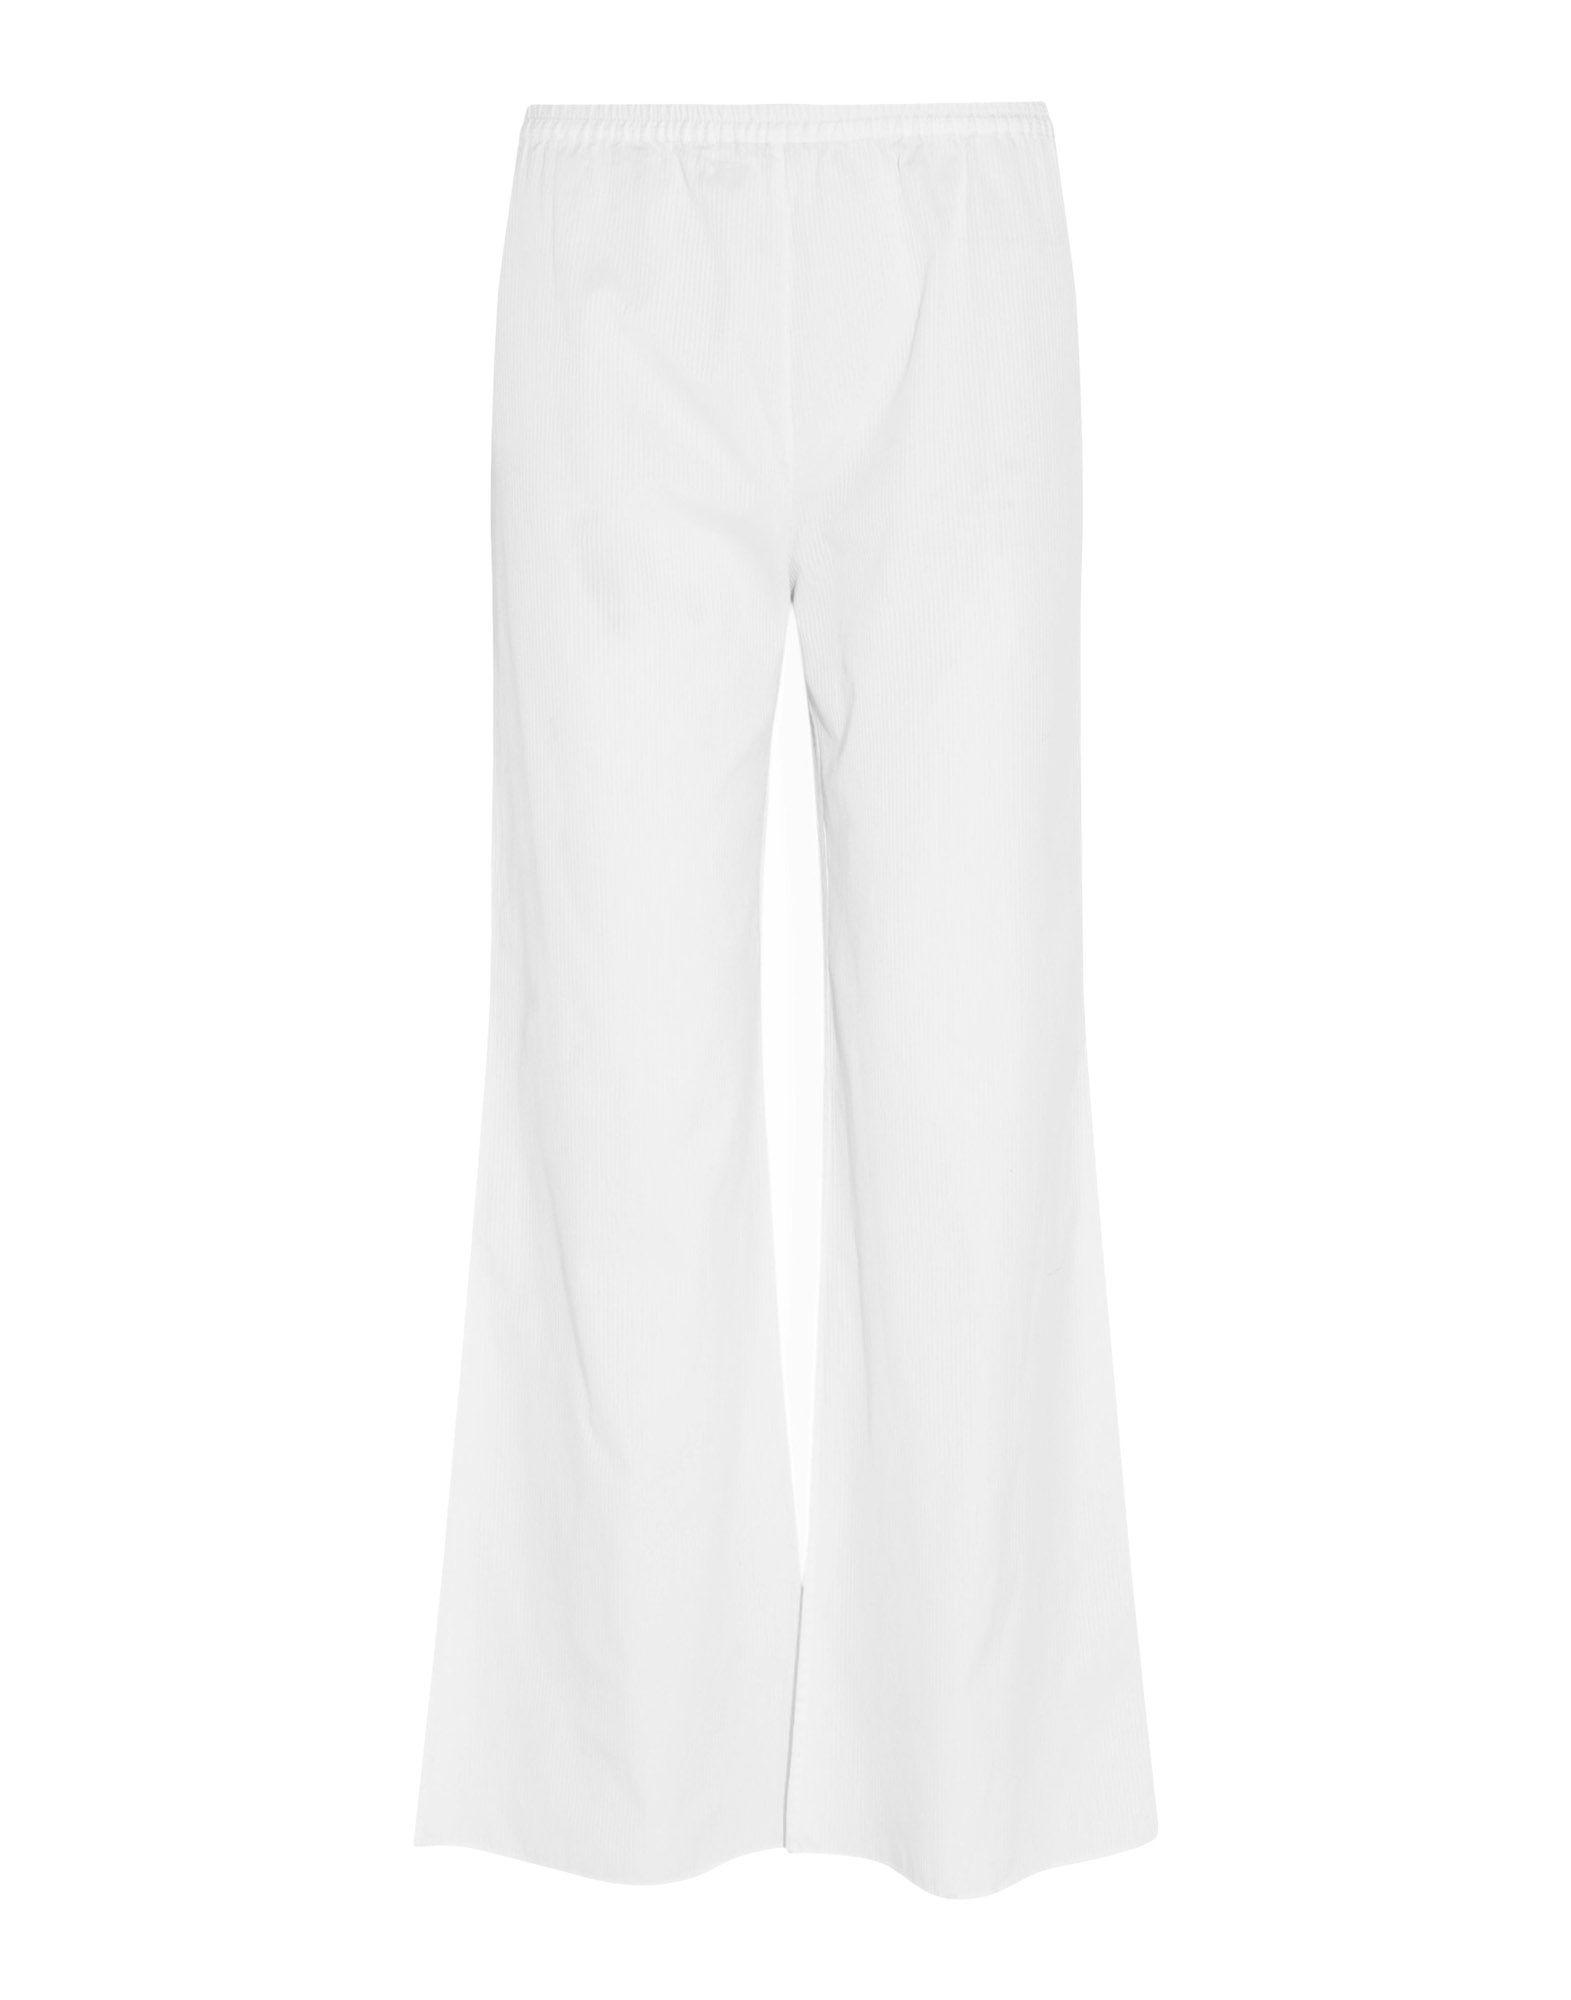 THREE GRACES LONDON Пижама пижамные комплекты